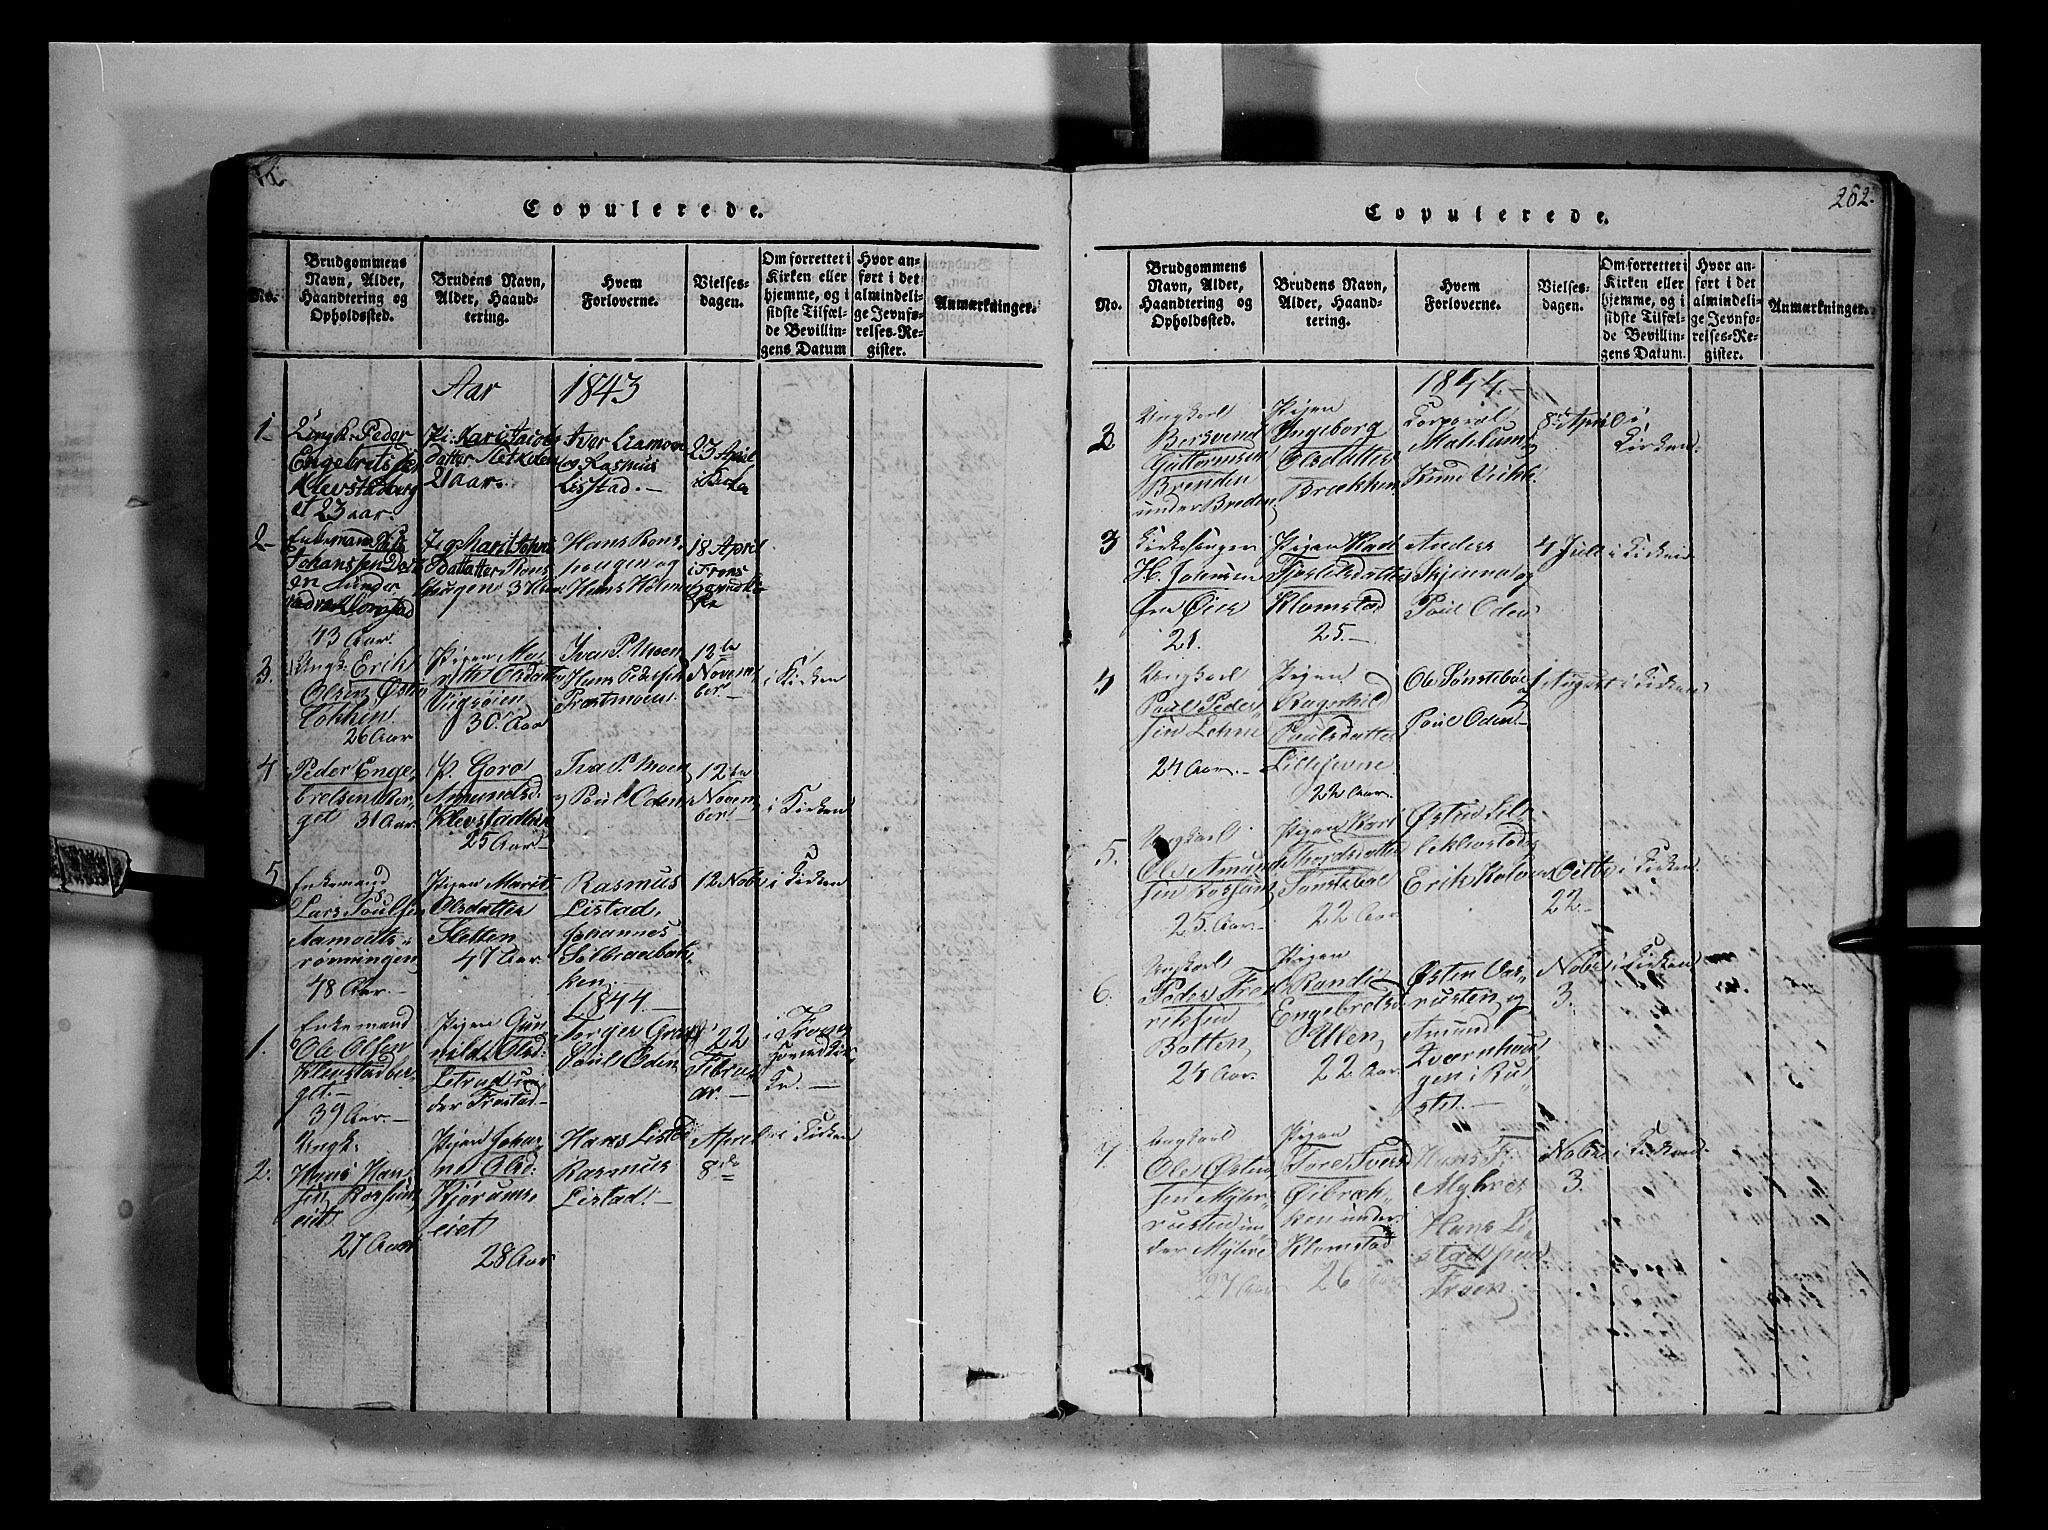 SAH, Fron prestekontor, H/Ha/Hab/L0002: Klokkerbok nr. 2, 1816-1850, s. 202